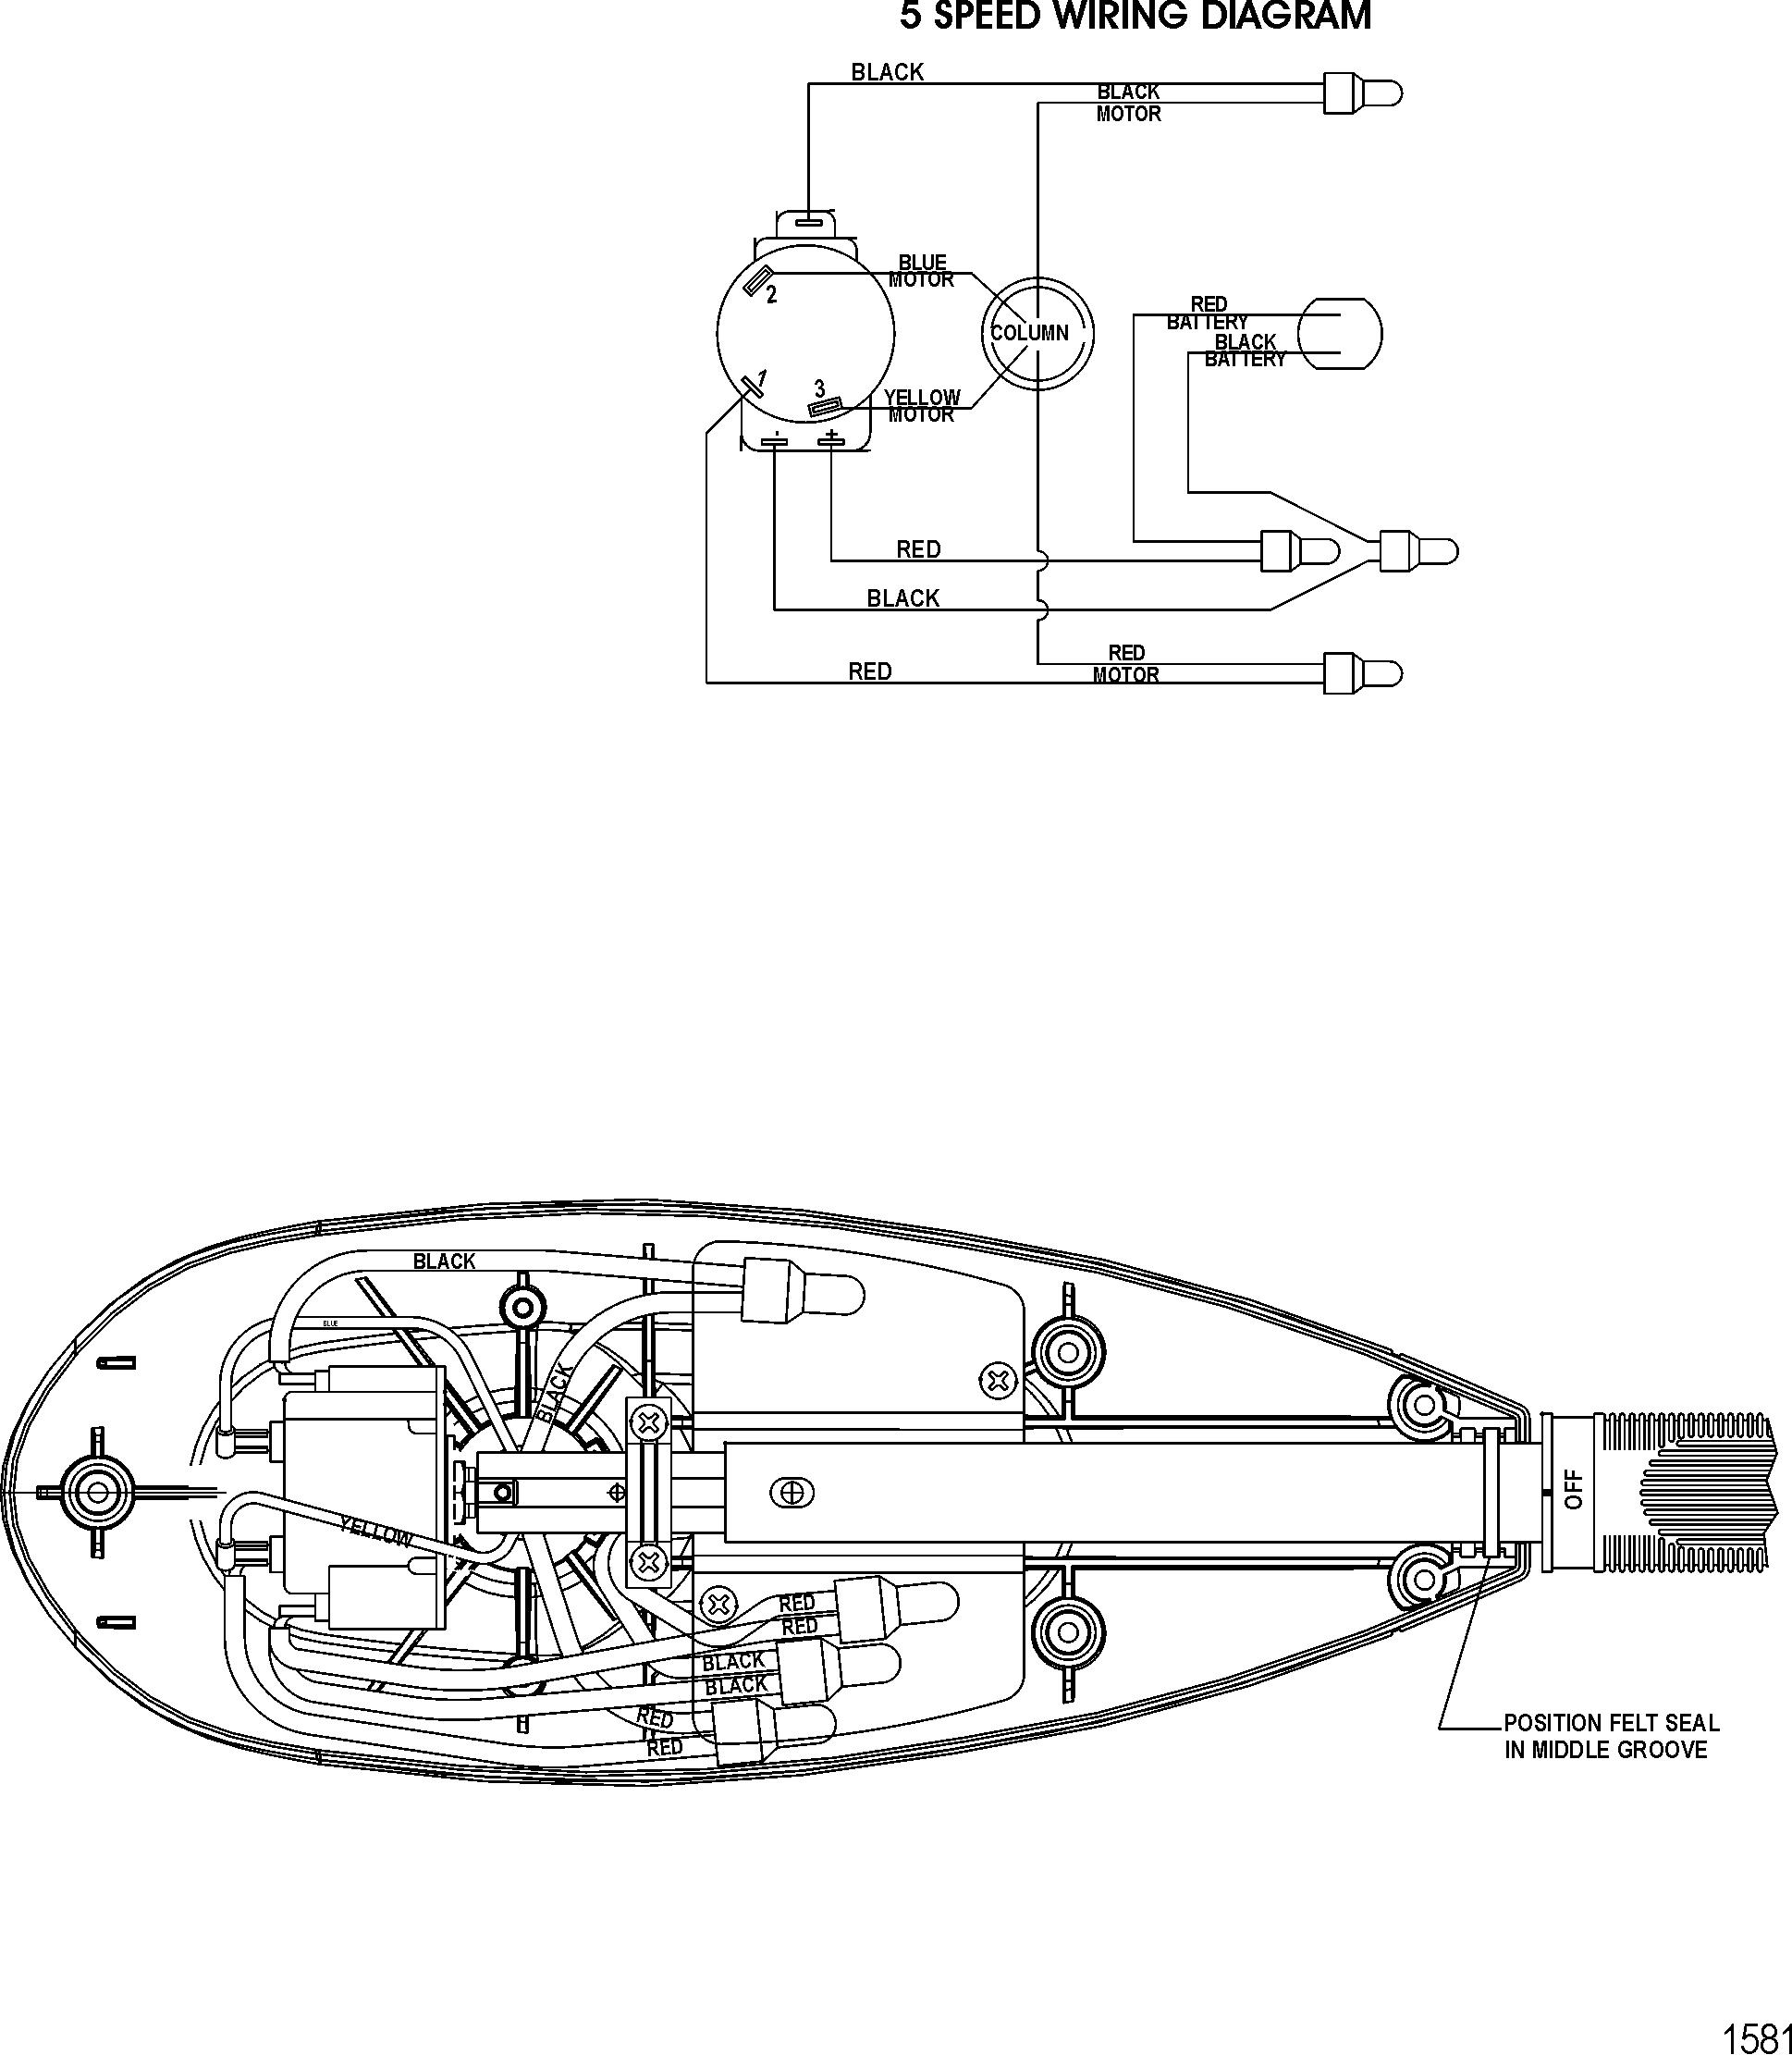 Mercury Trolling Motor Motorguide Tt Thruster Series 0u018186 12 Volt Boat Wiring Diagram Thru 0u025101 Wire Diagrammodel Tt4500